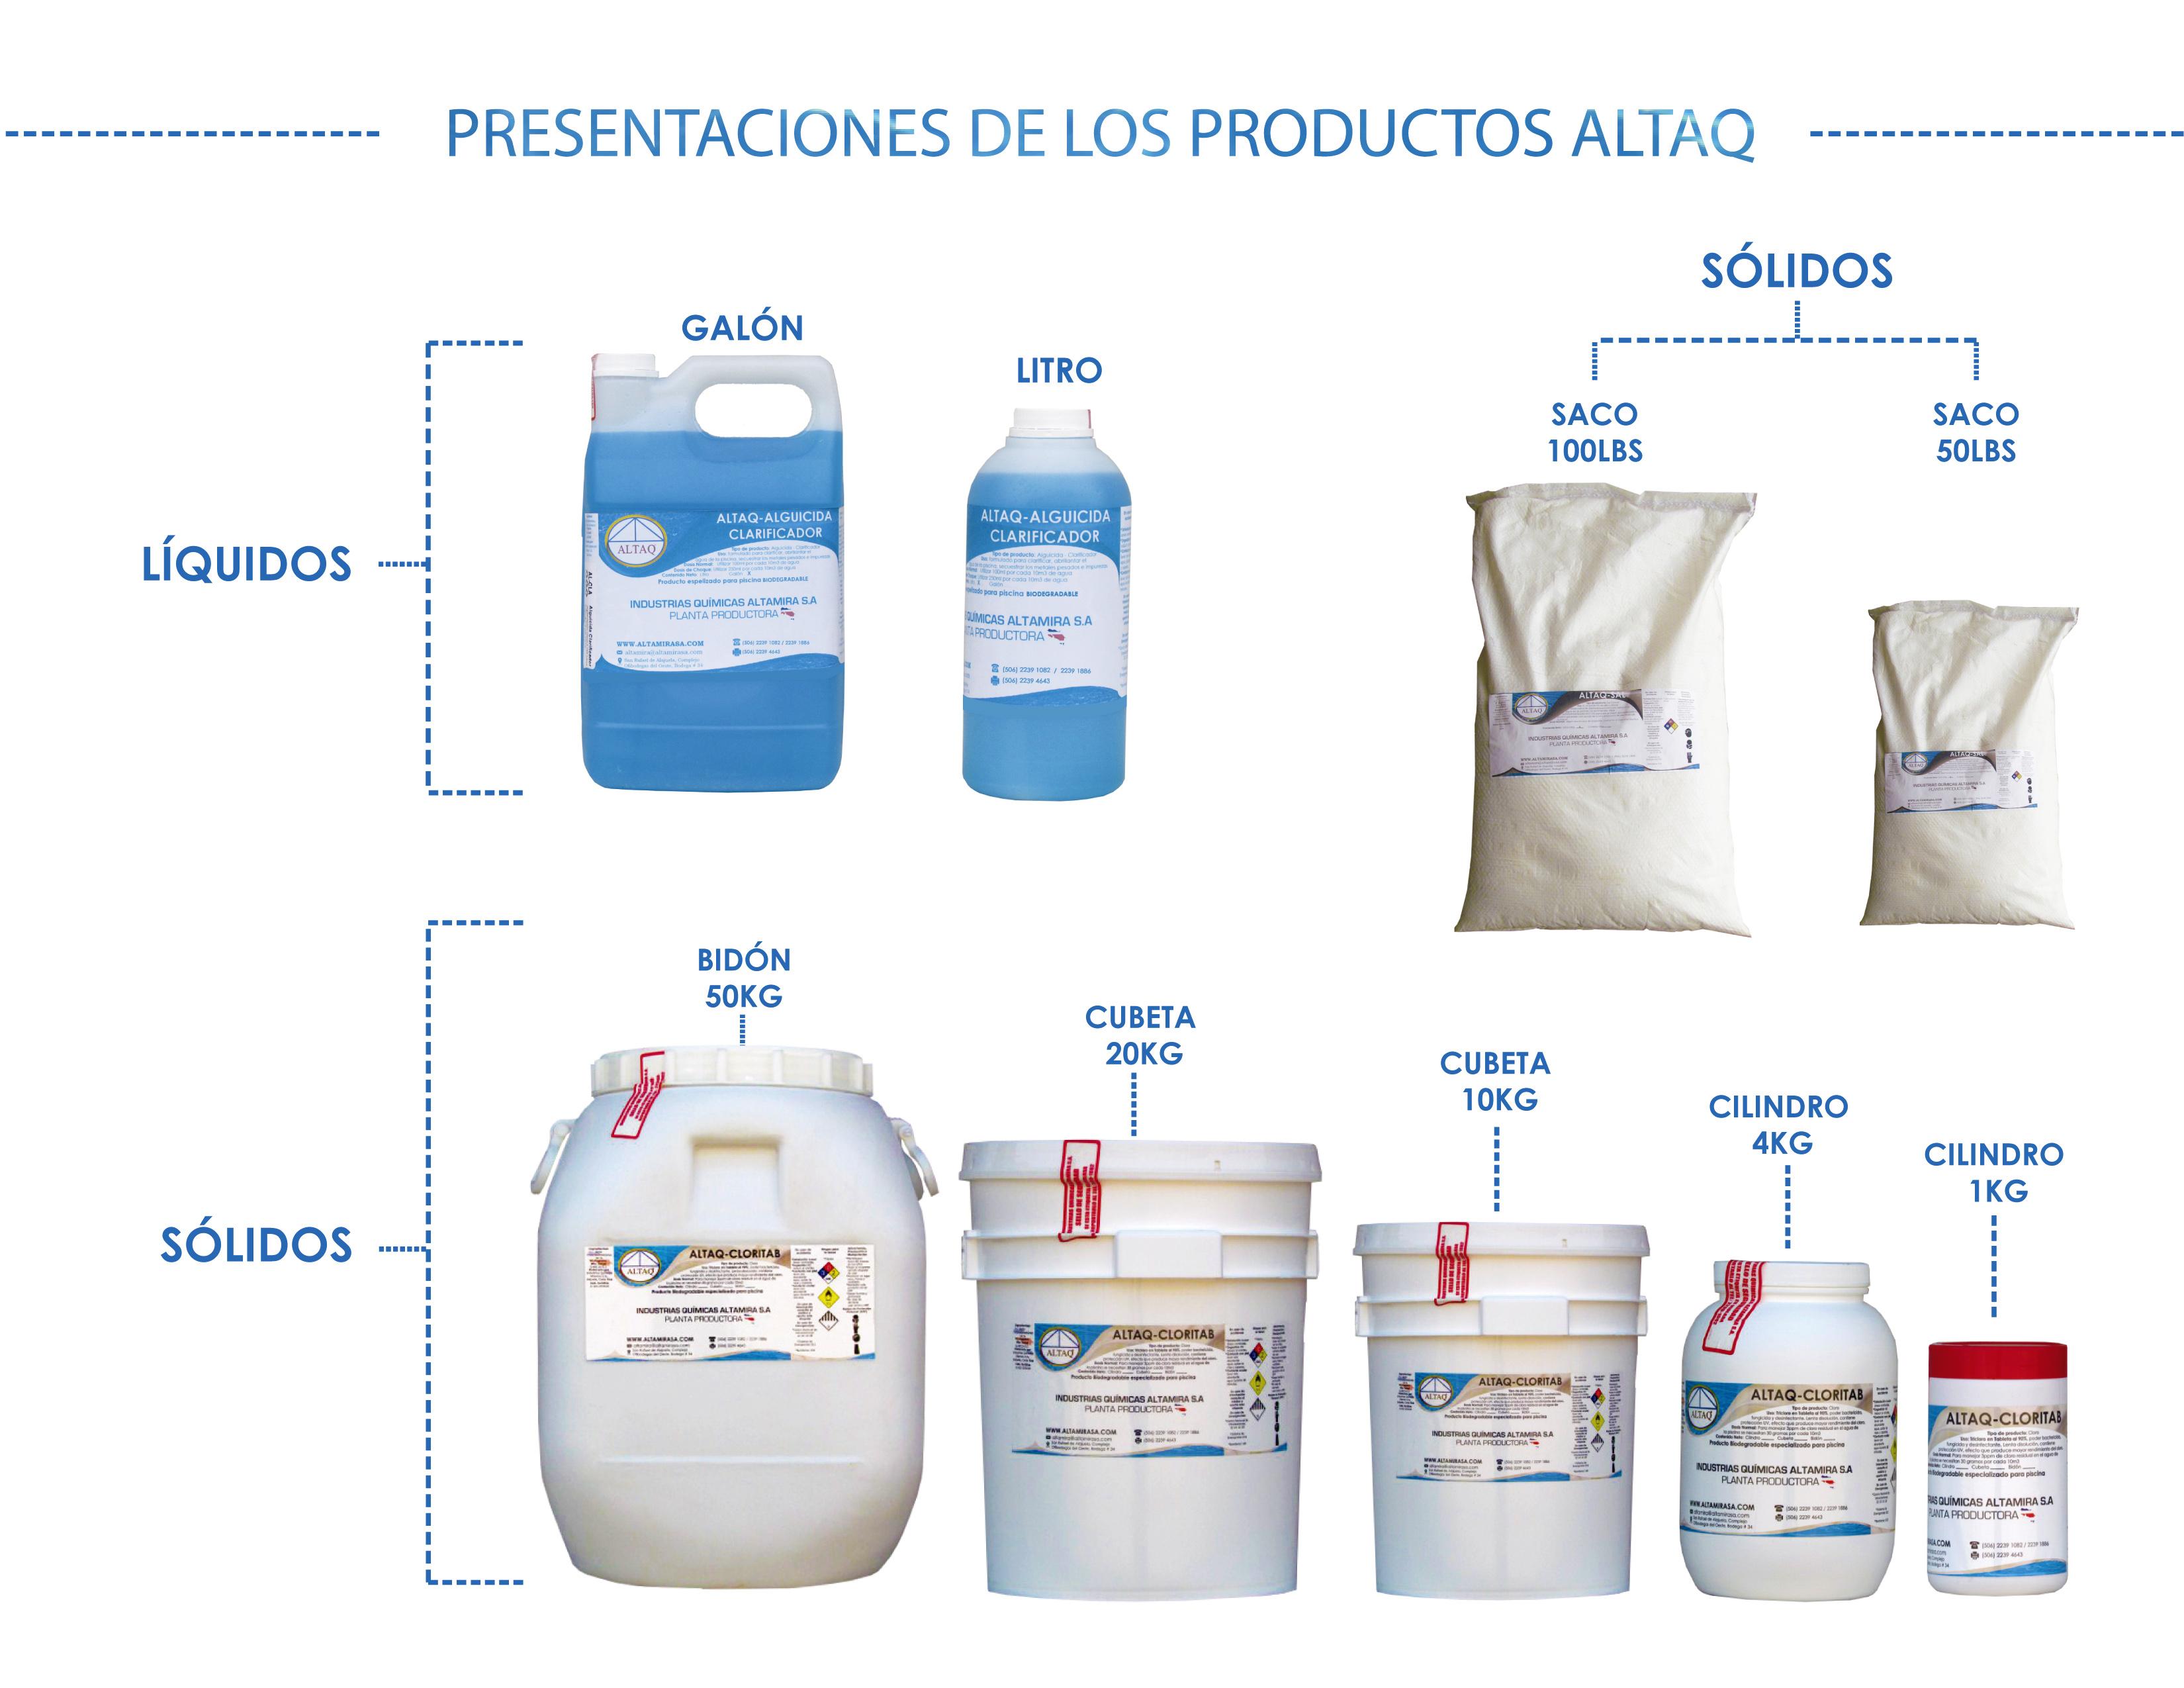 Productos para piscinas capacitaci n altaq piscinas for Productos para piscinas